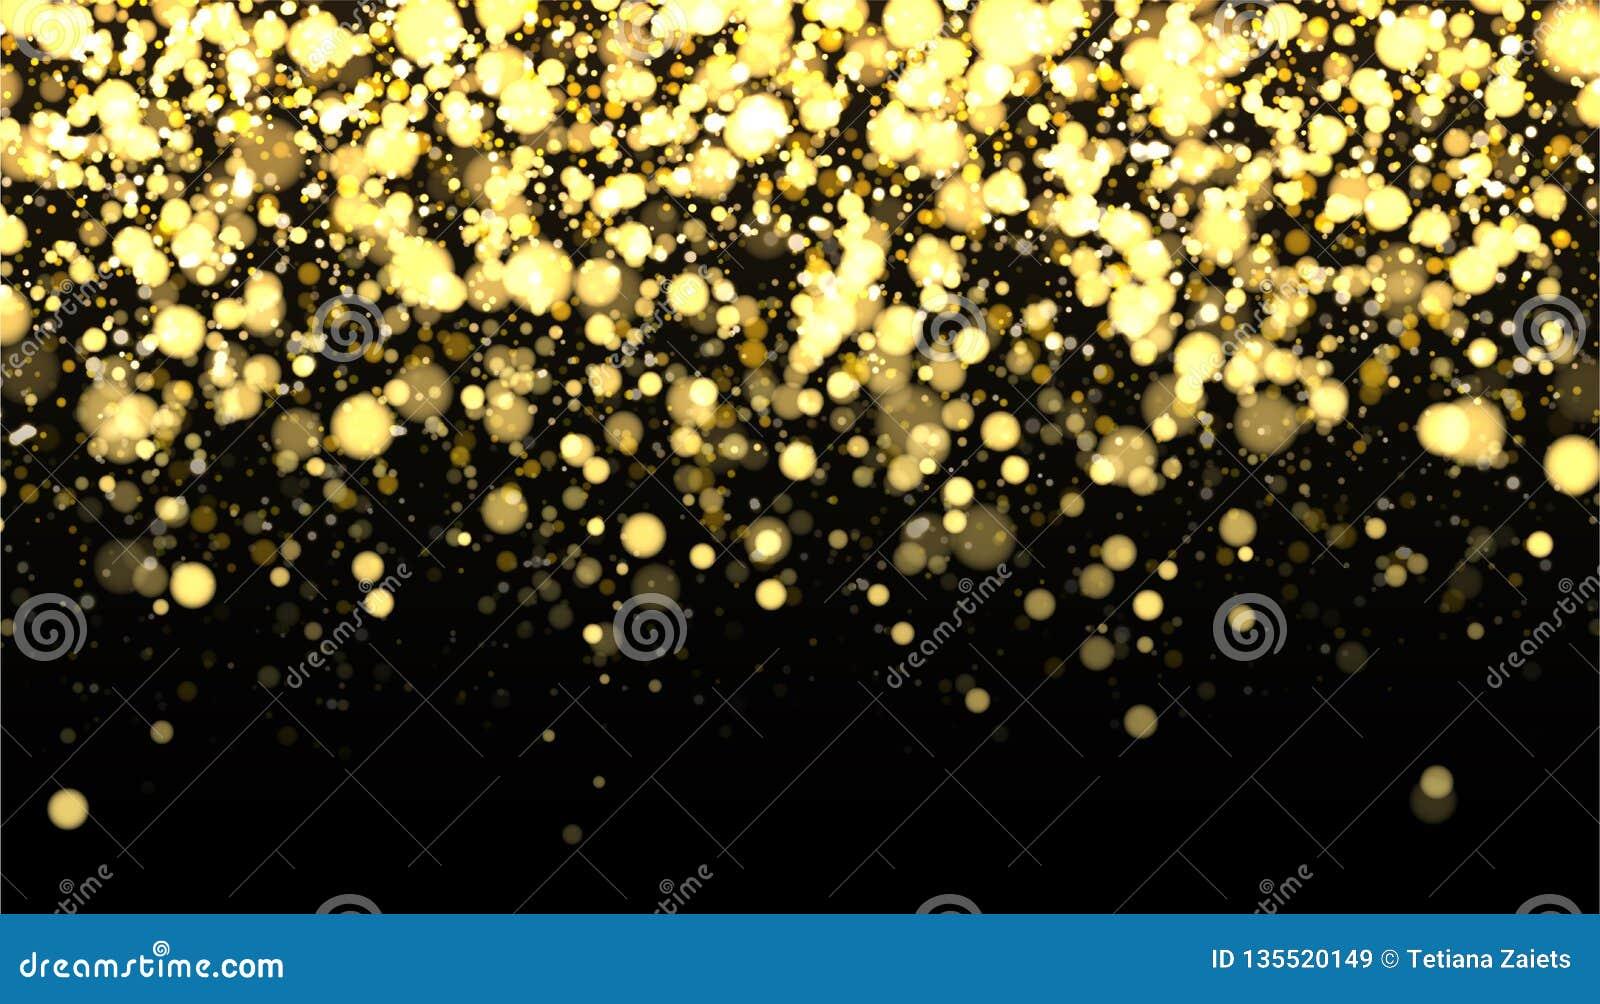 Gold blurred border on black background. Glittering falling confetti backdrop. Golden shimmer texture for luxury design